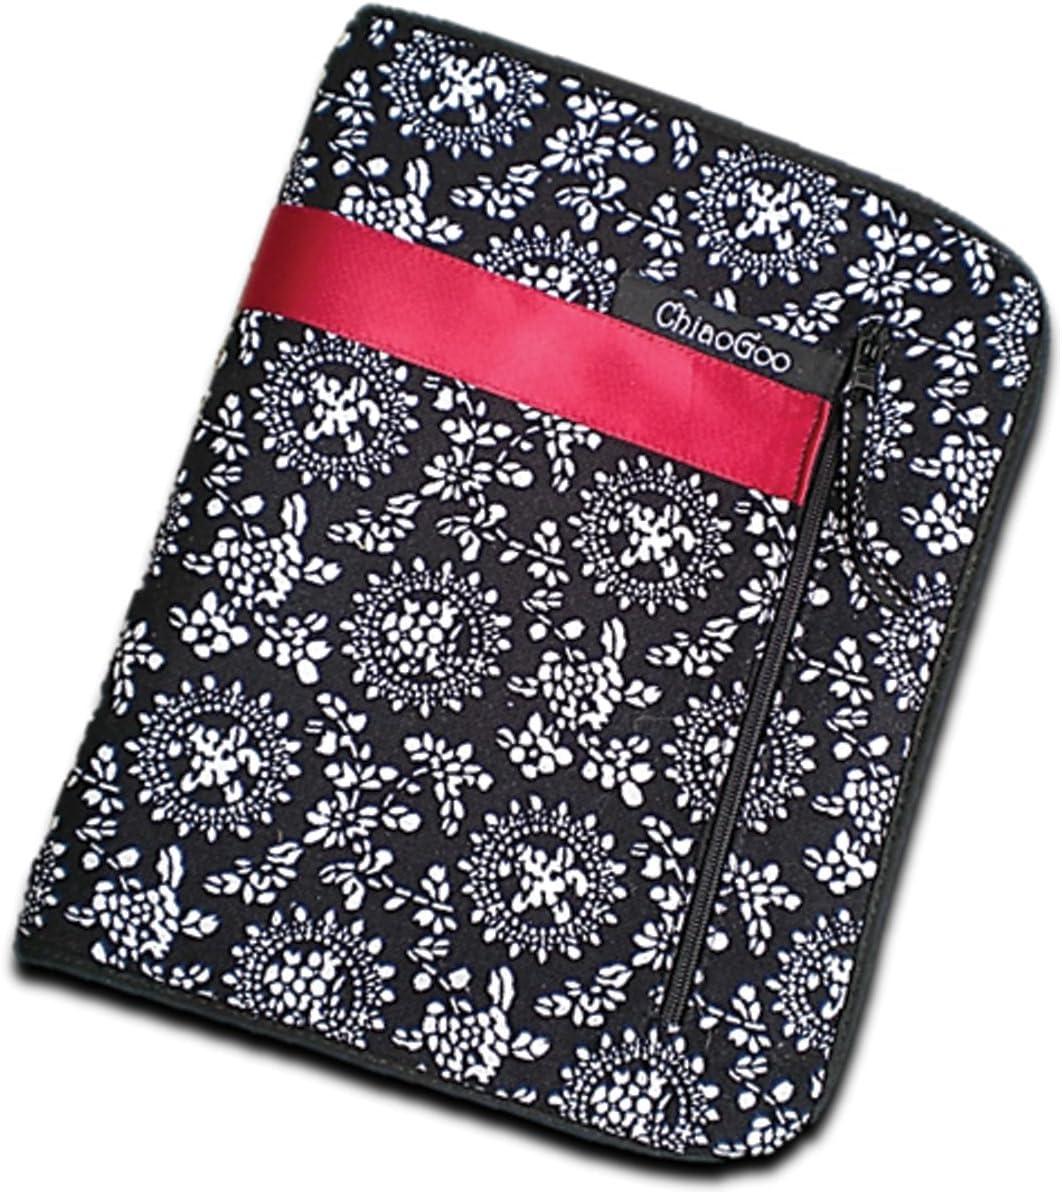 "B00QXJP92G ChiaoGoo TWIST Red Lace Interchangeable Knitting Needle 5"" Tip Set, Small 81wasXBJVCL.SL1200_"